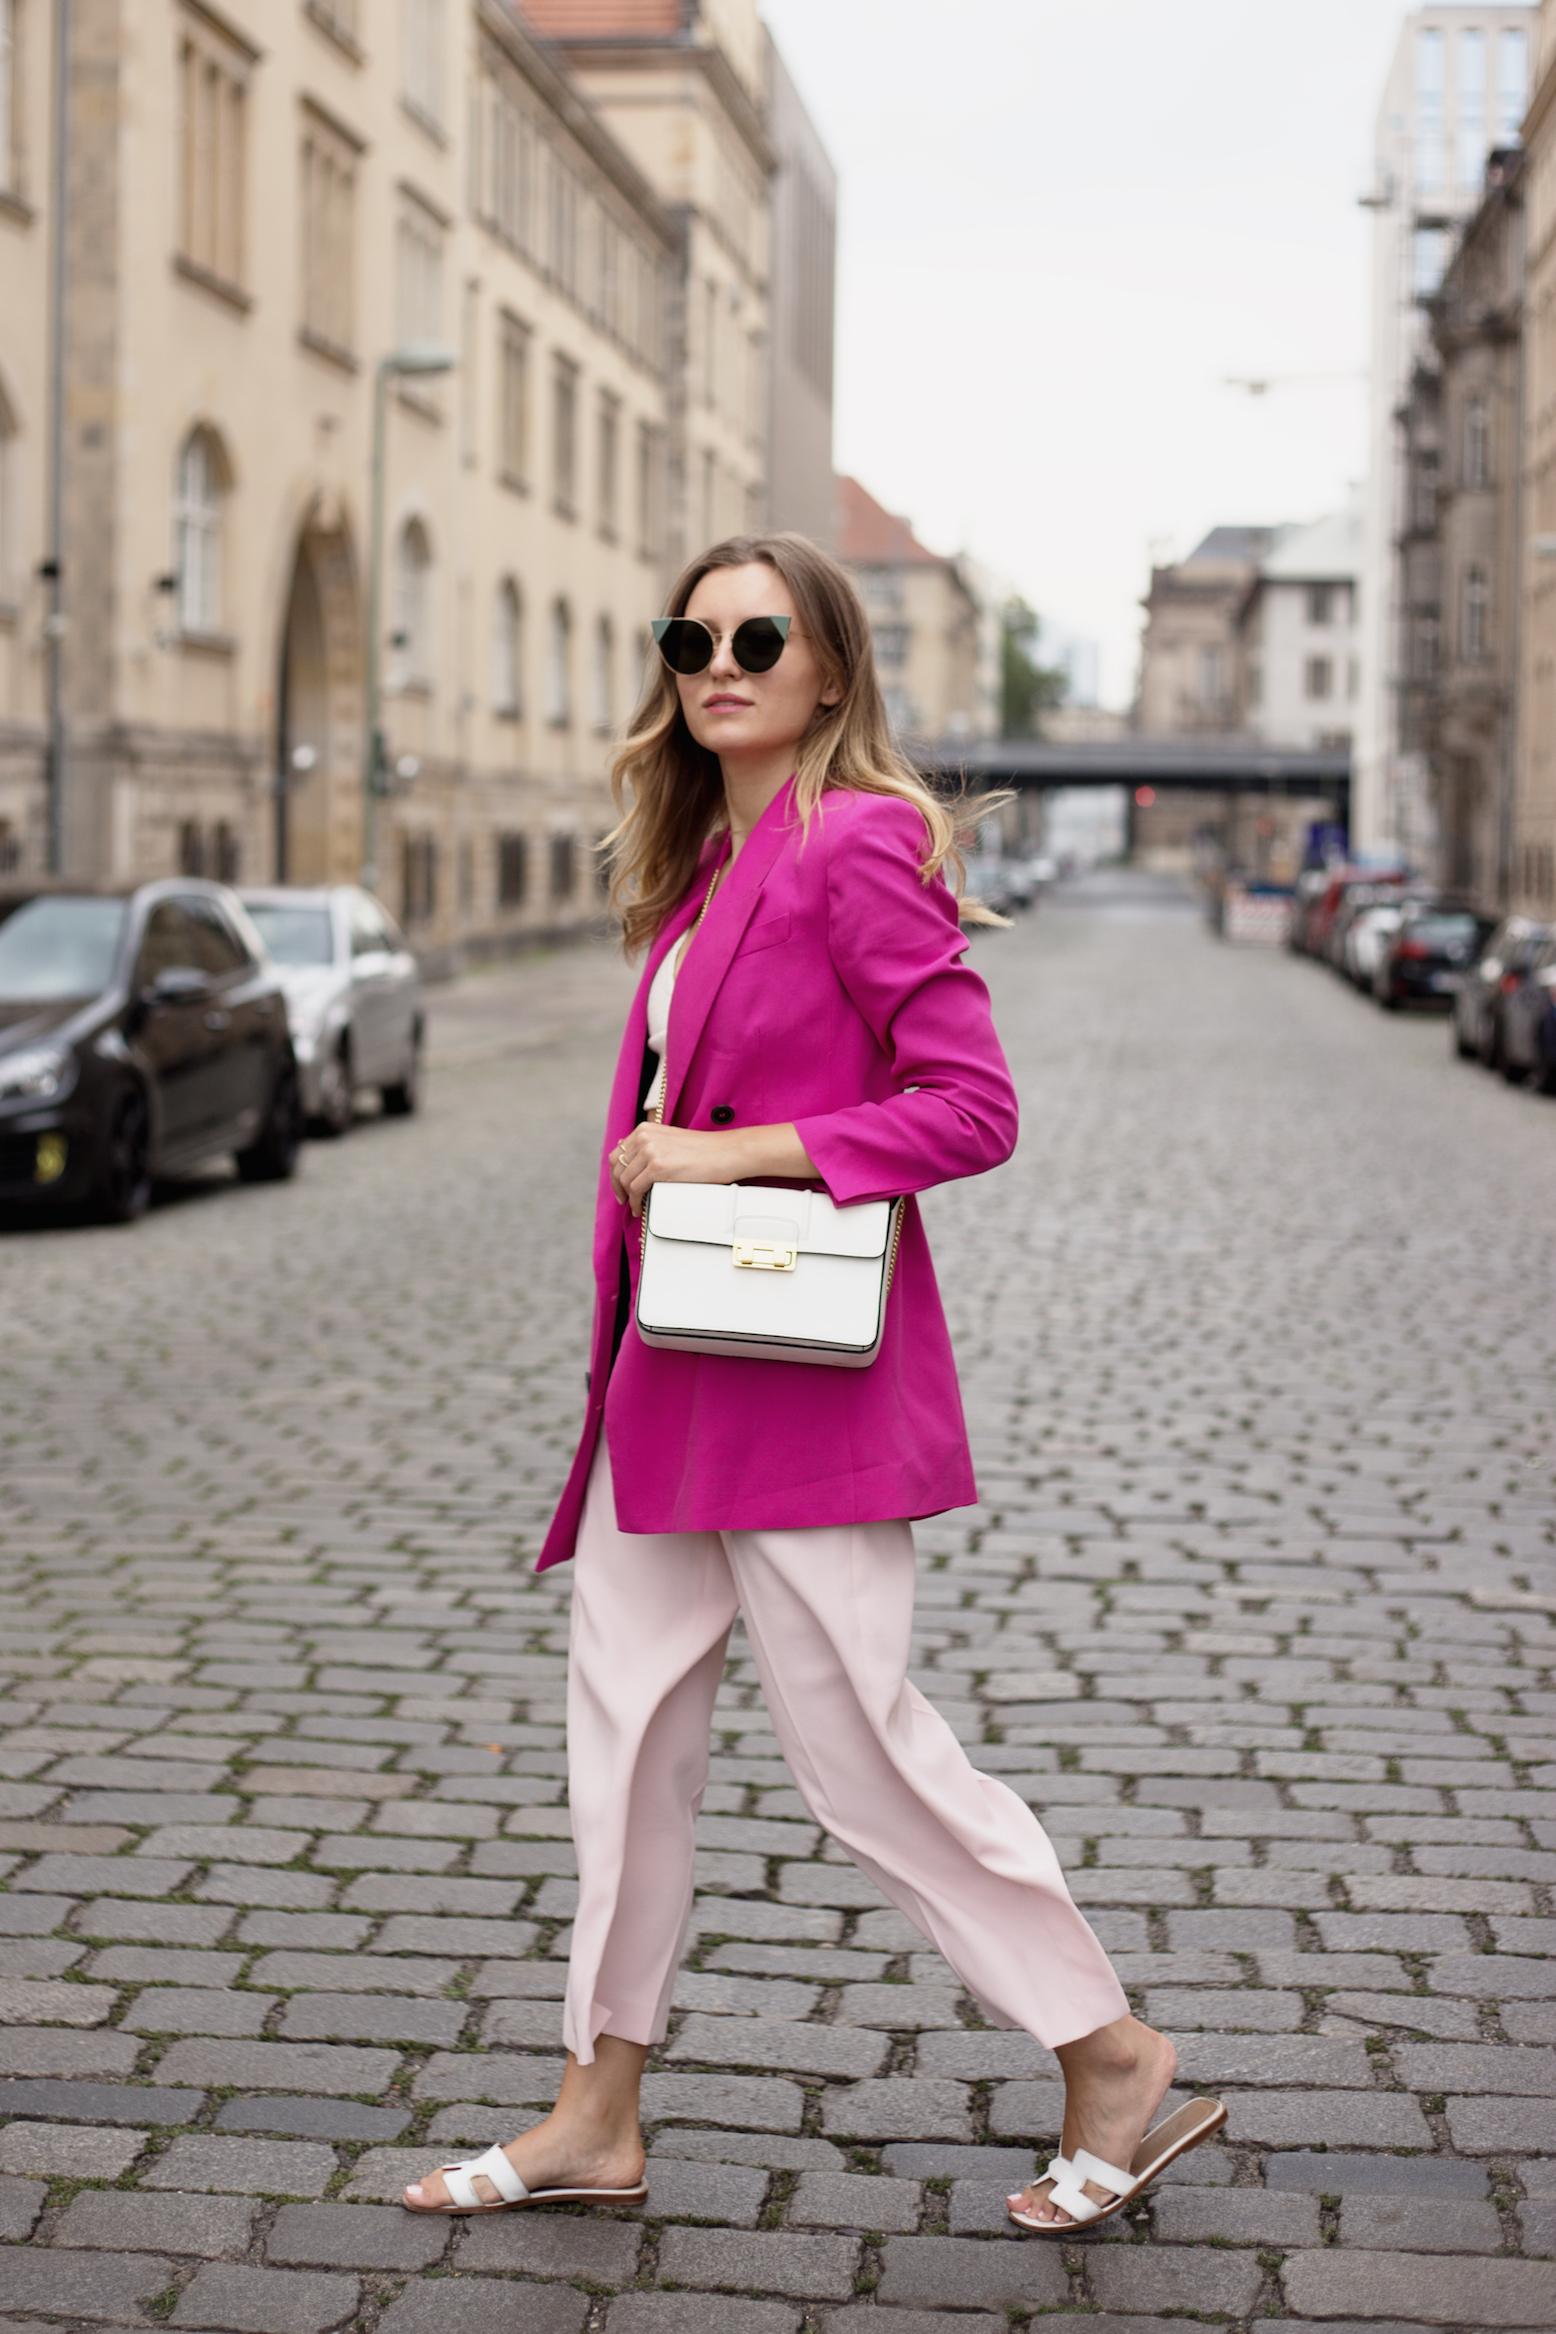 fendi-lei-sunglasses-hermes-oran-livia-auer-IMG_9381